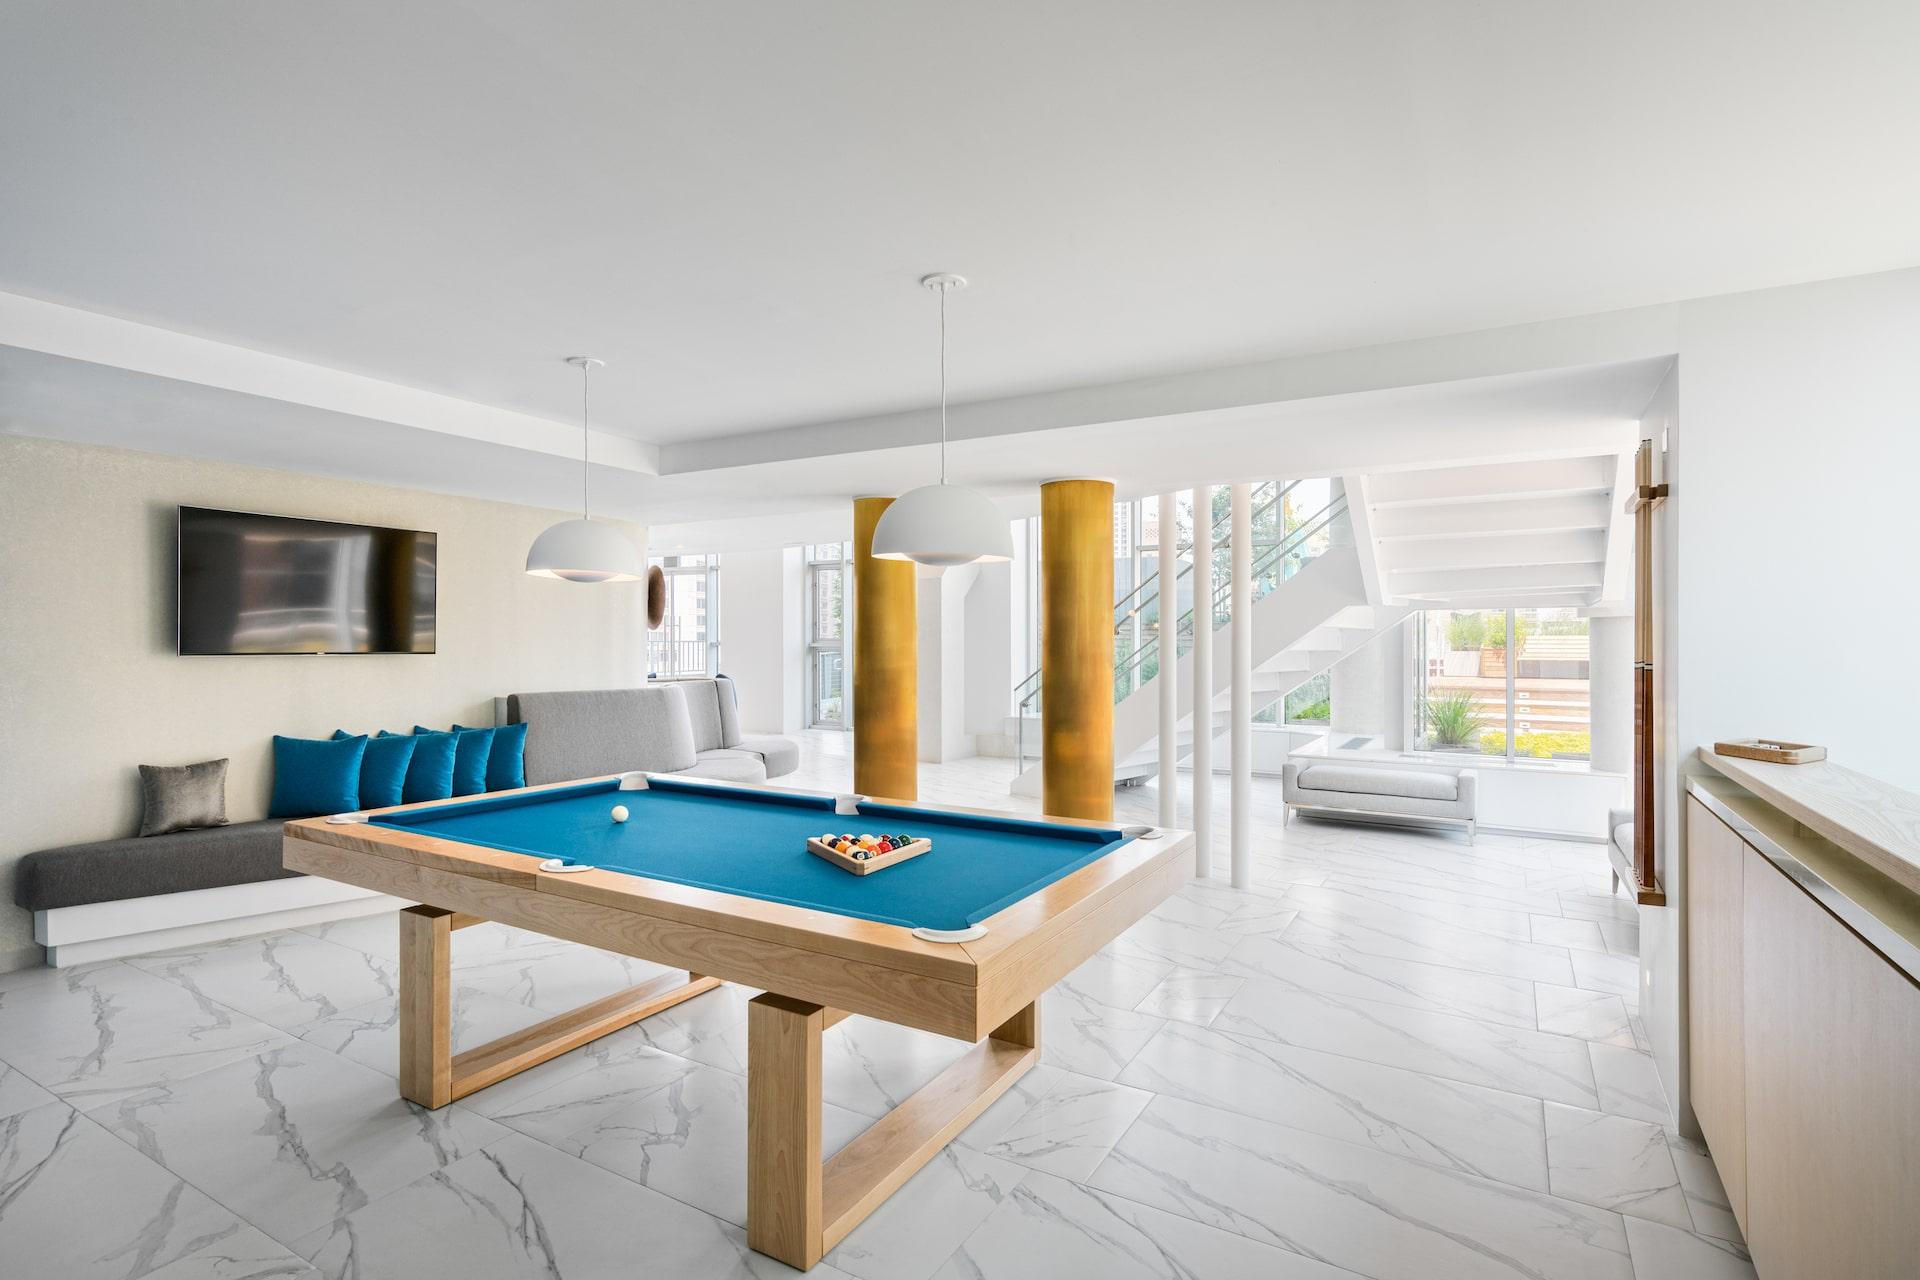 101 West End Avenue Amenities billiards